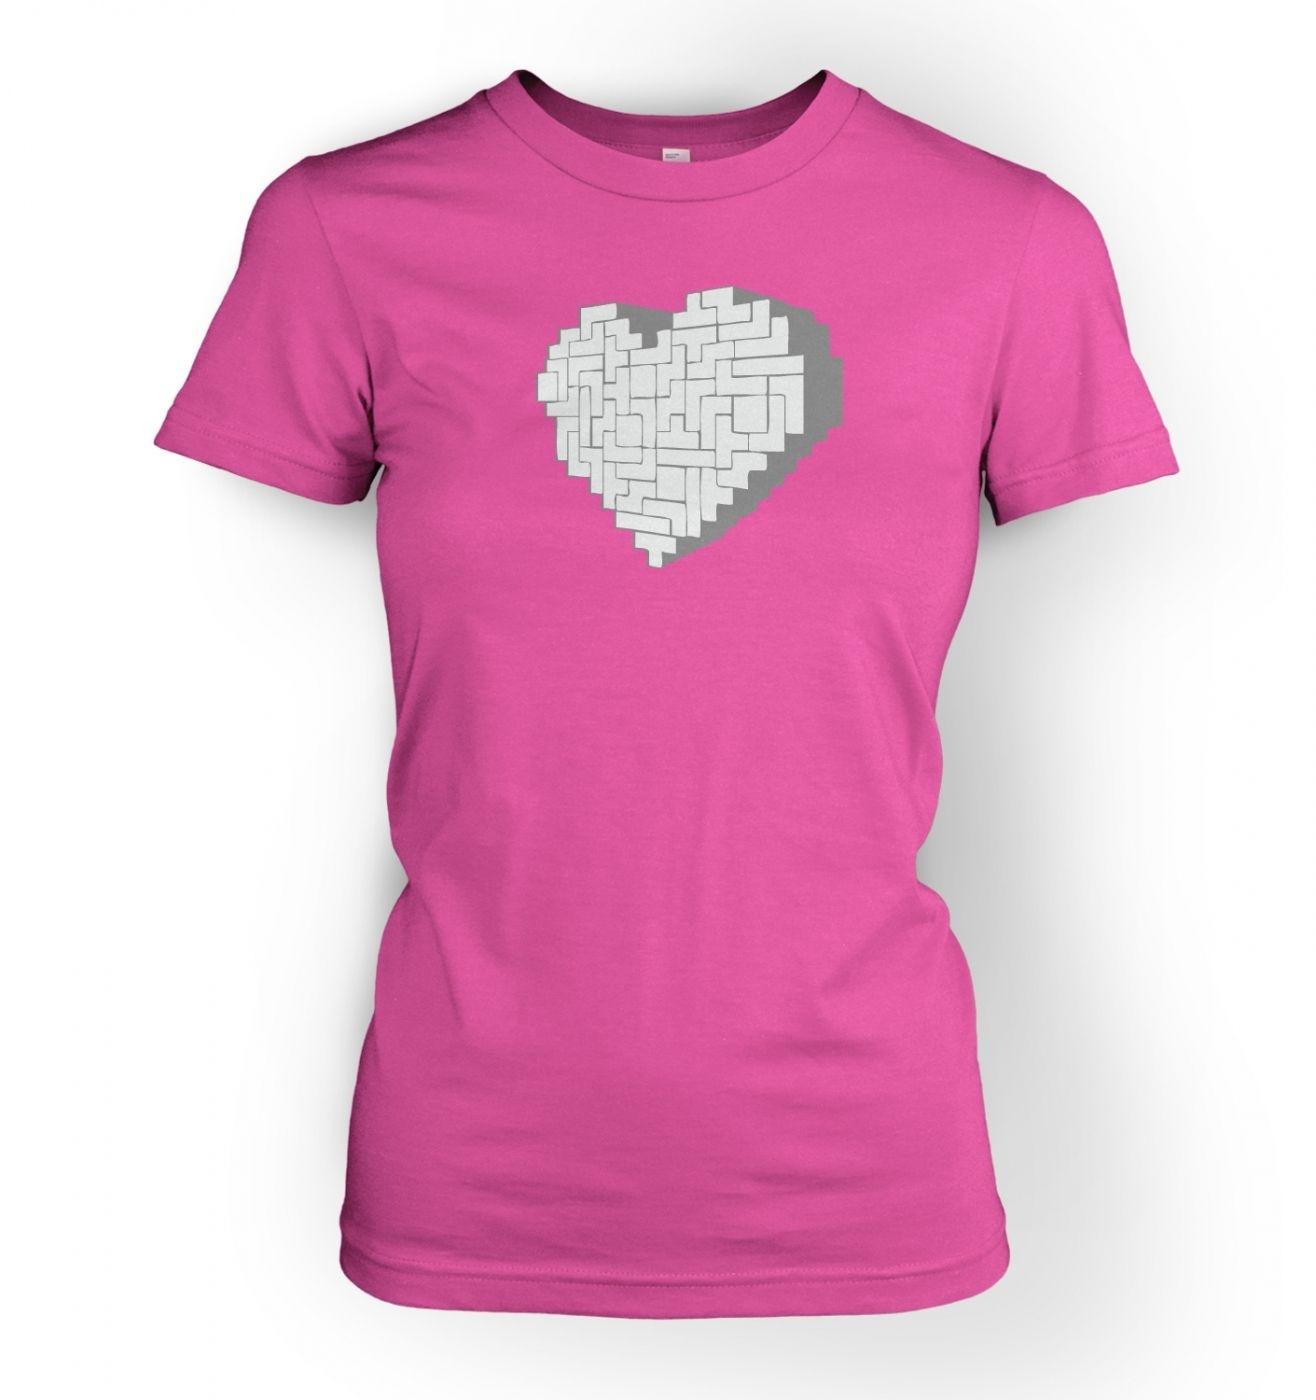 Shaped Brick Heart women's fitted t-shirt